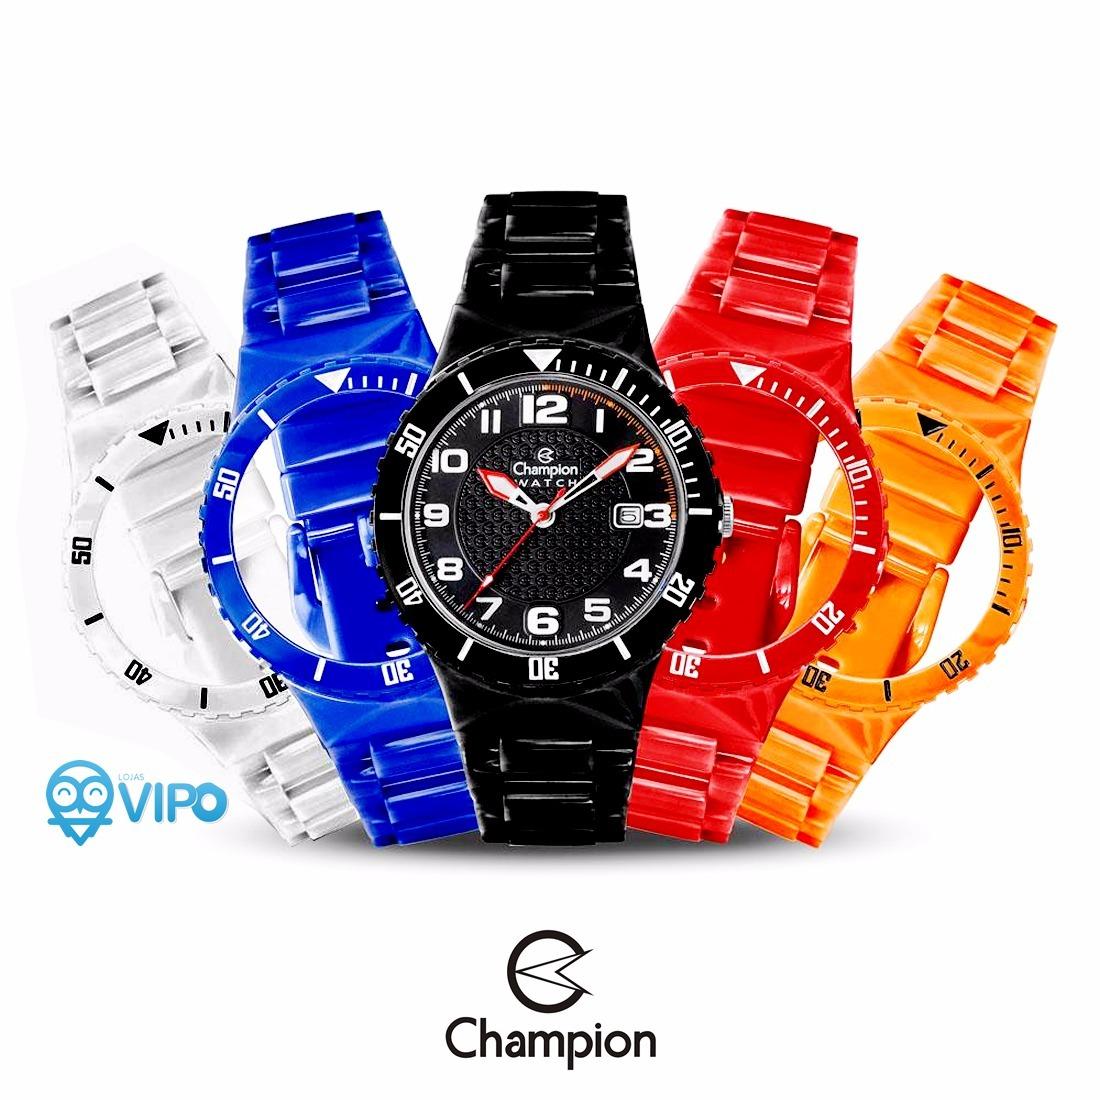 da7dd4ecc23 relógio unissex troca pulseiras analógico champion cp30119x. Carregando  zoom.